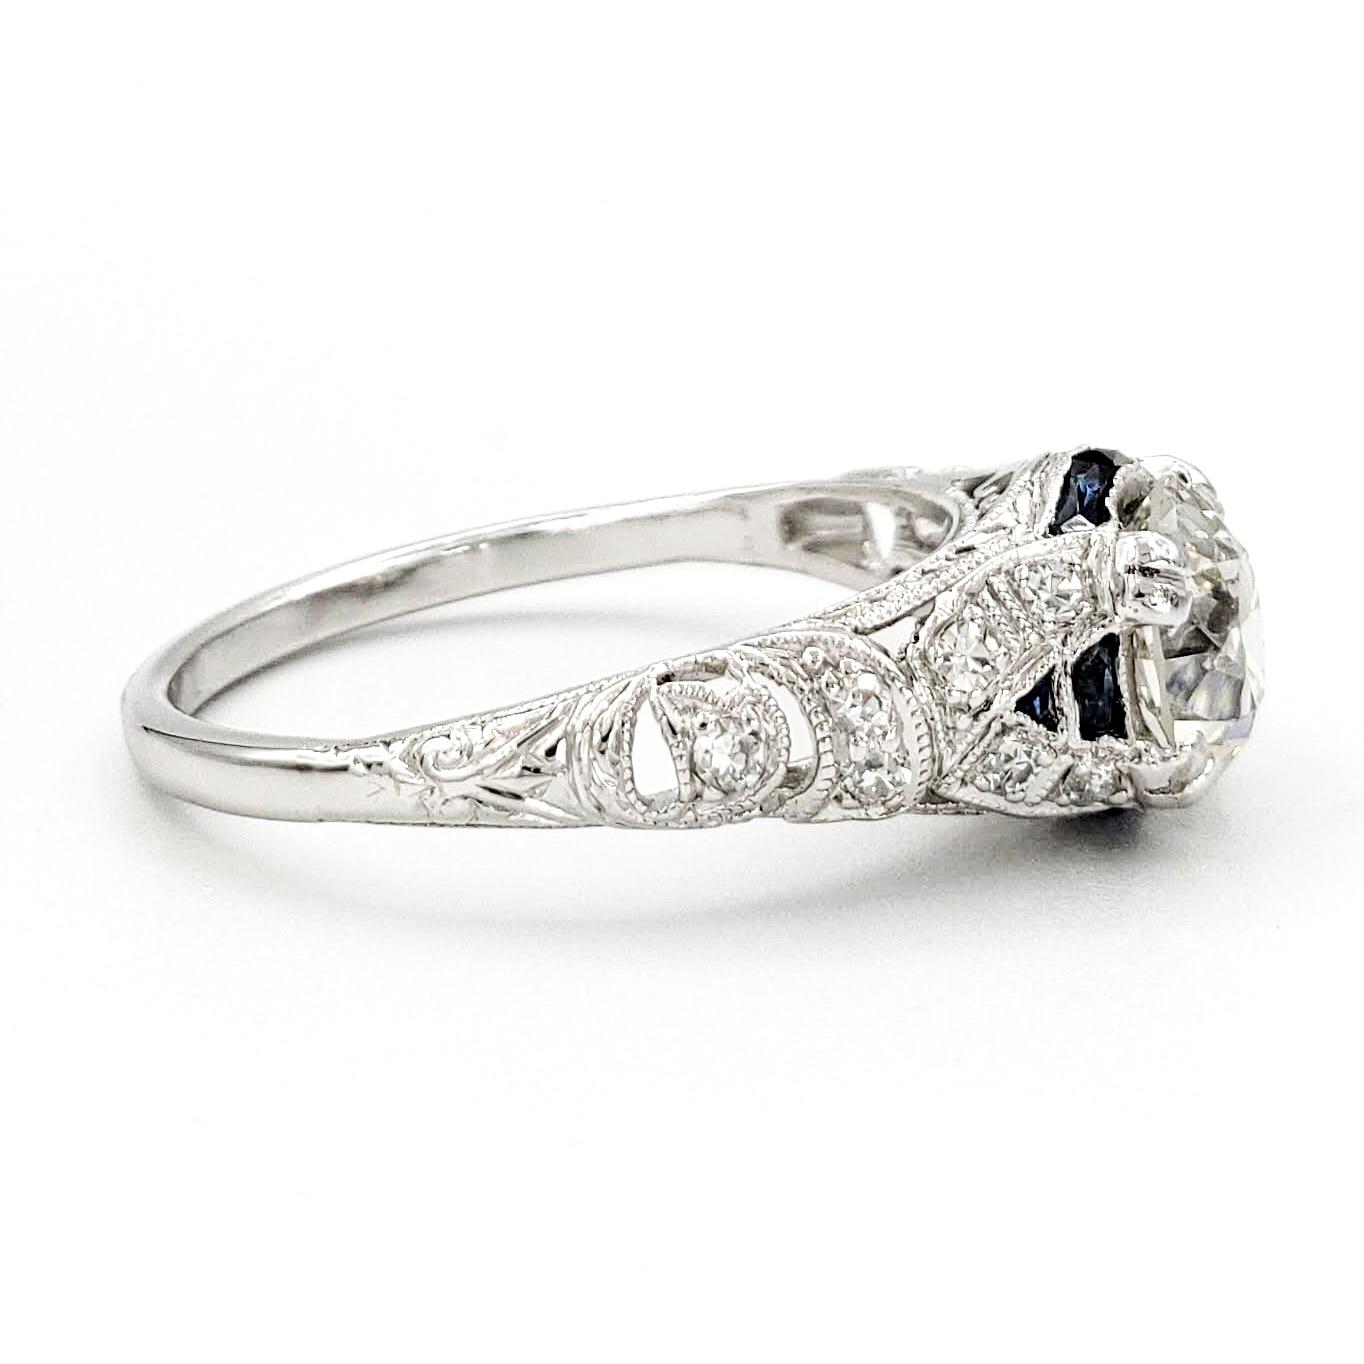 vintage-platinum-engagement-ring-with-1-25-carat-old-european-cut-diamond-egl-j-vvs2